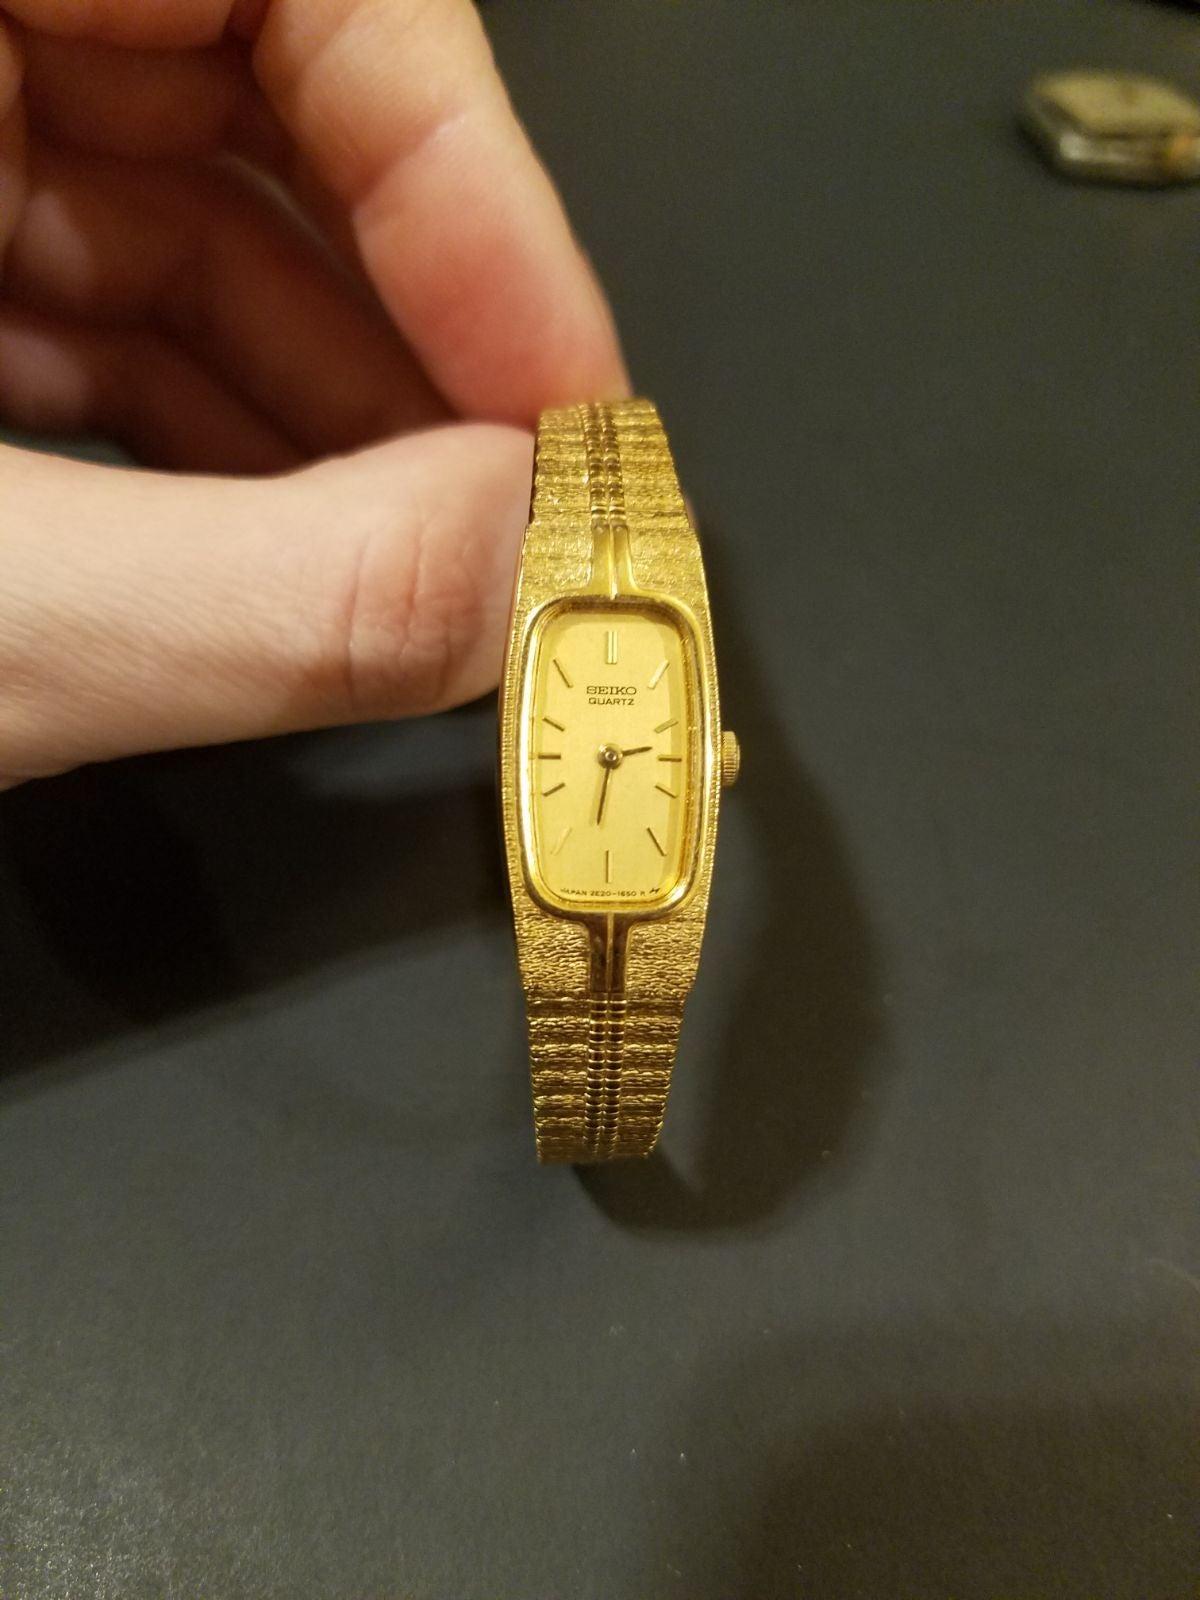 Seiko quartz vintage gold watch